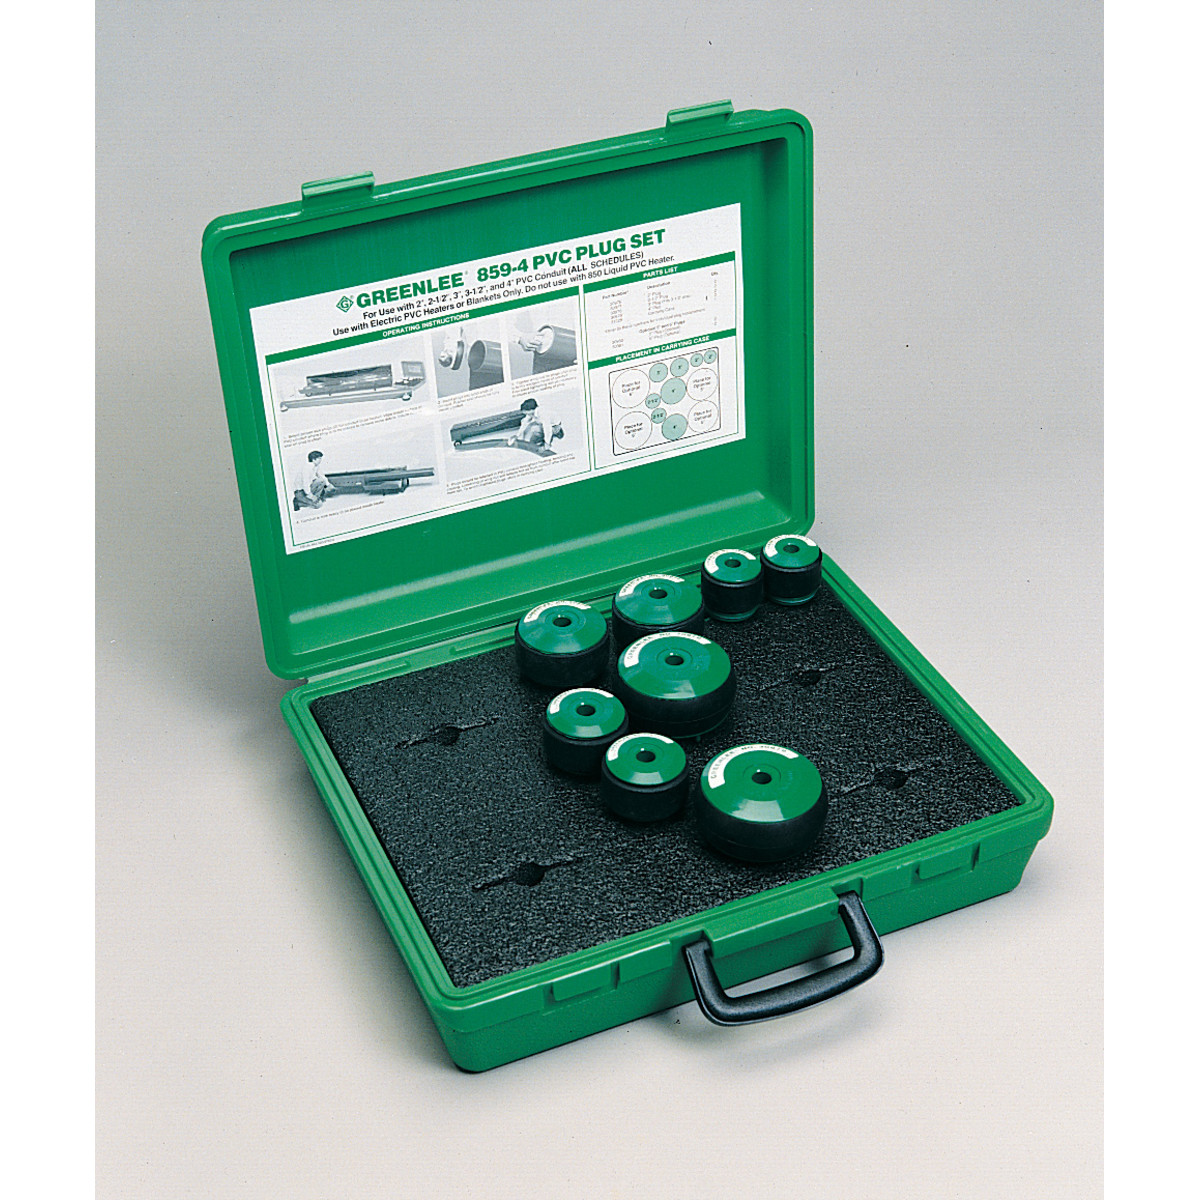 "Greenlee 859-4 PLUG SET-2""-4"" PVC (859-4)"